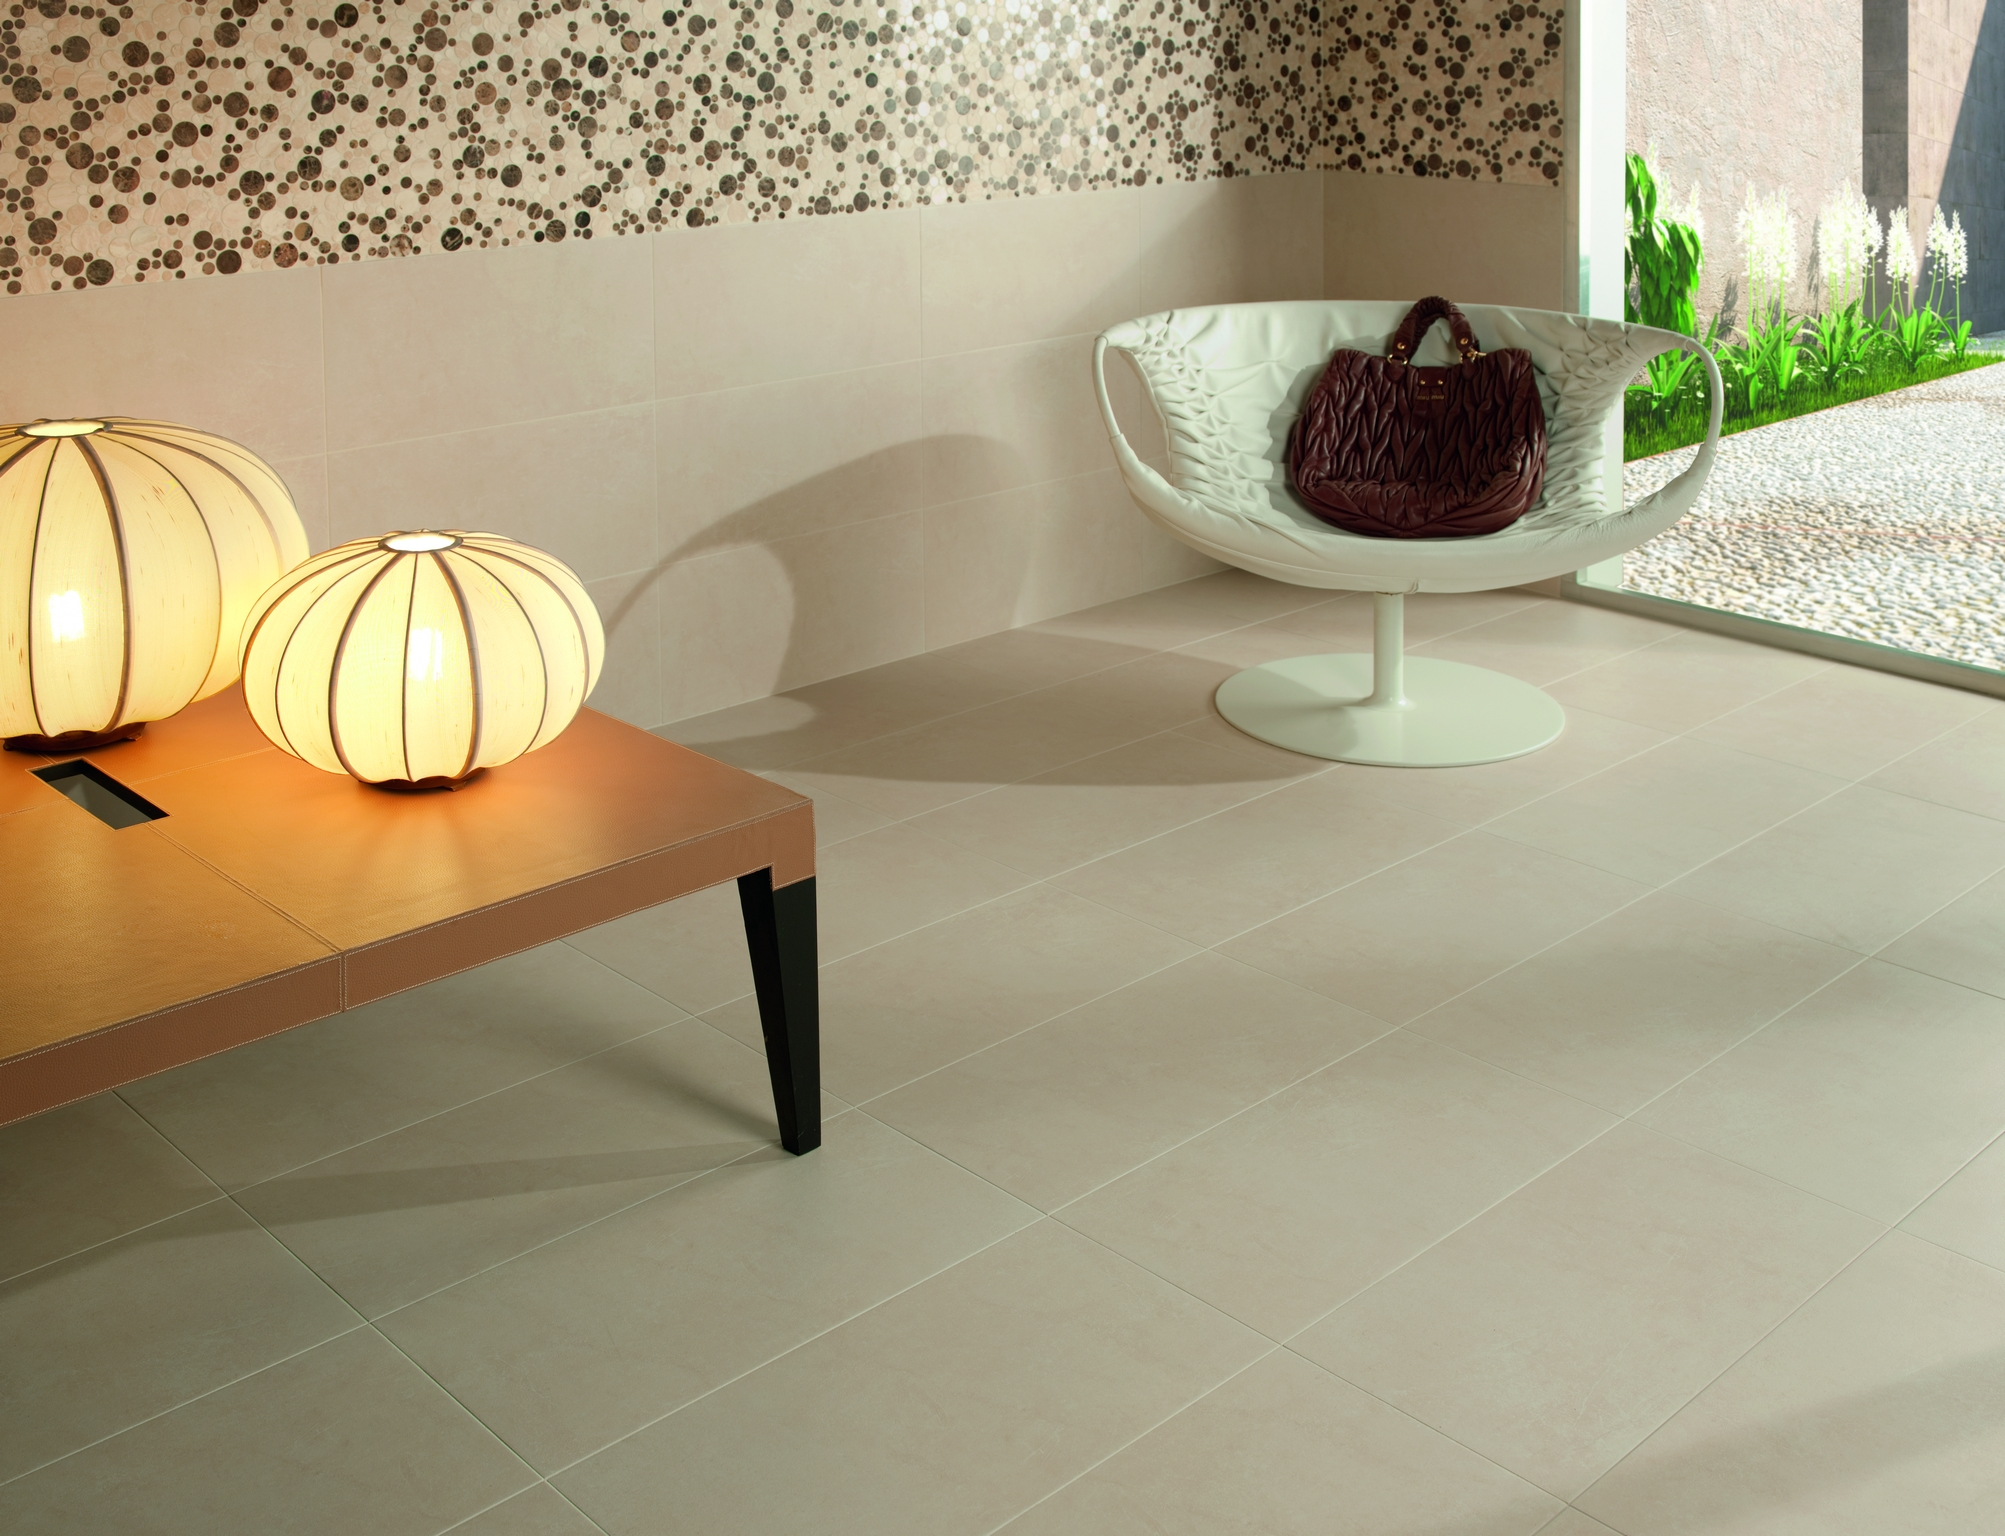 Ceramic vs porcelain tile for bathroom